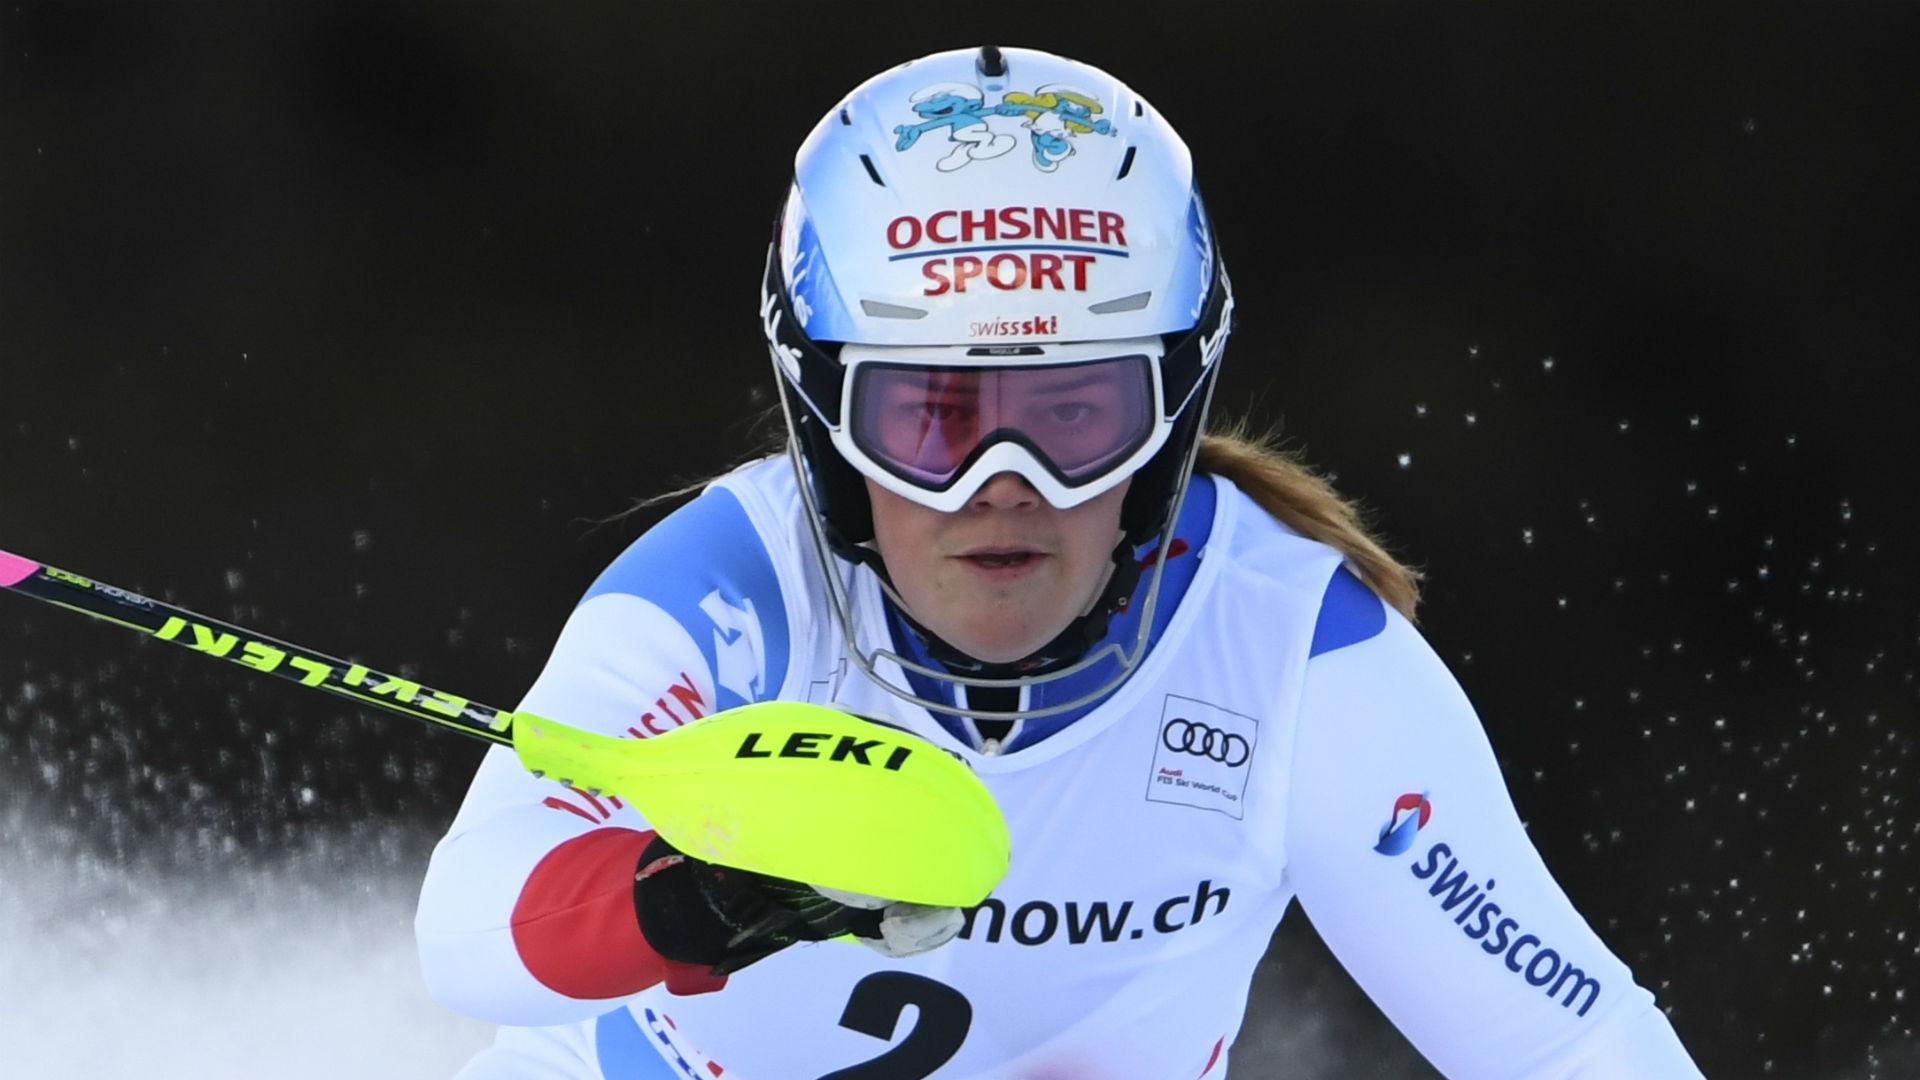 Pyeongchang 2018: Swiss star Meillard out of Winter Olympics